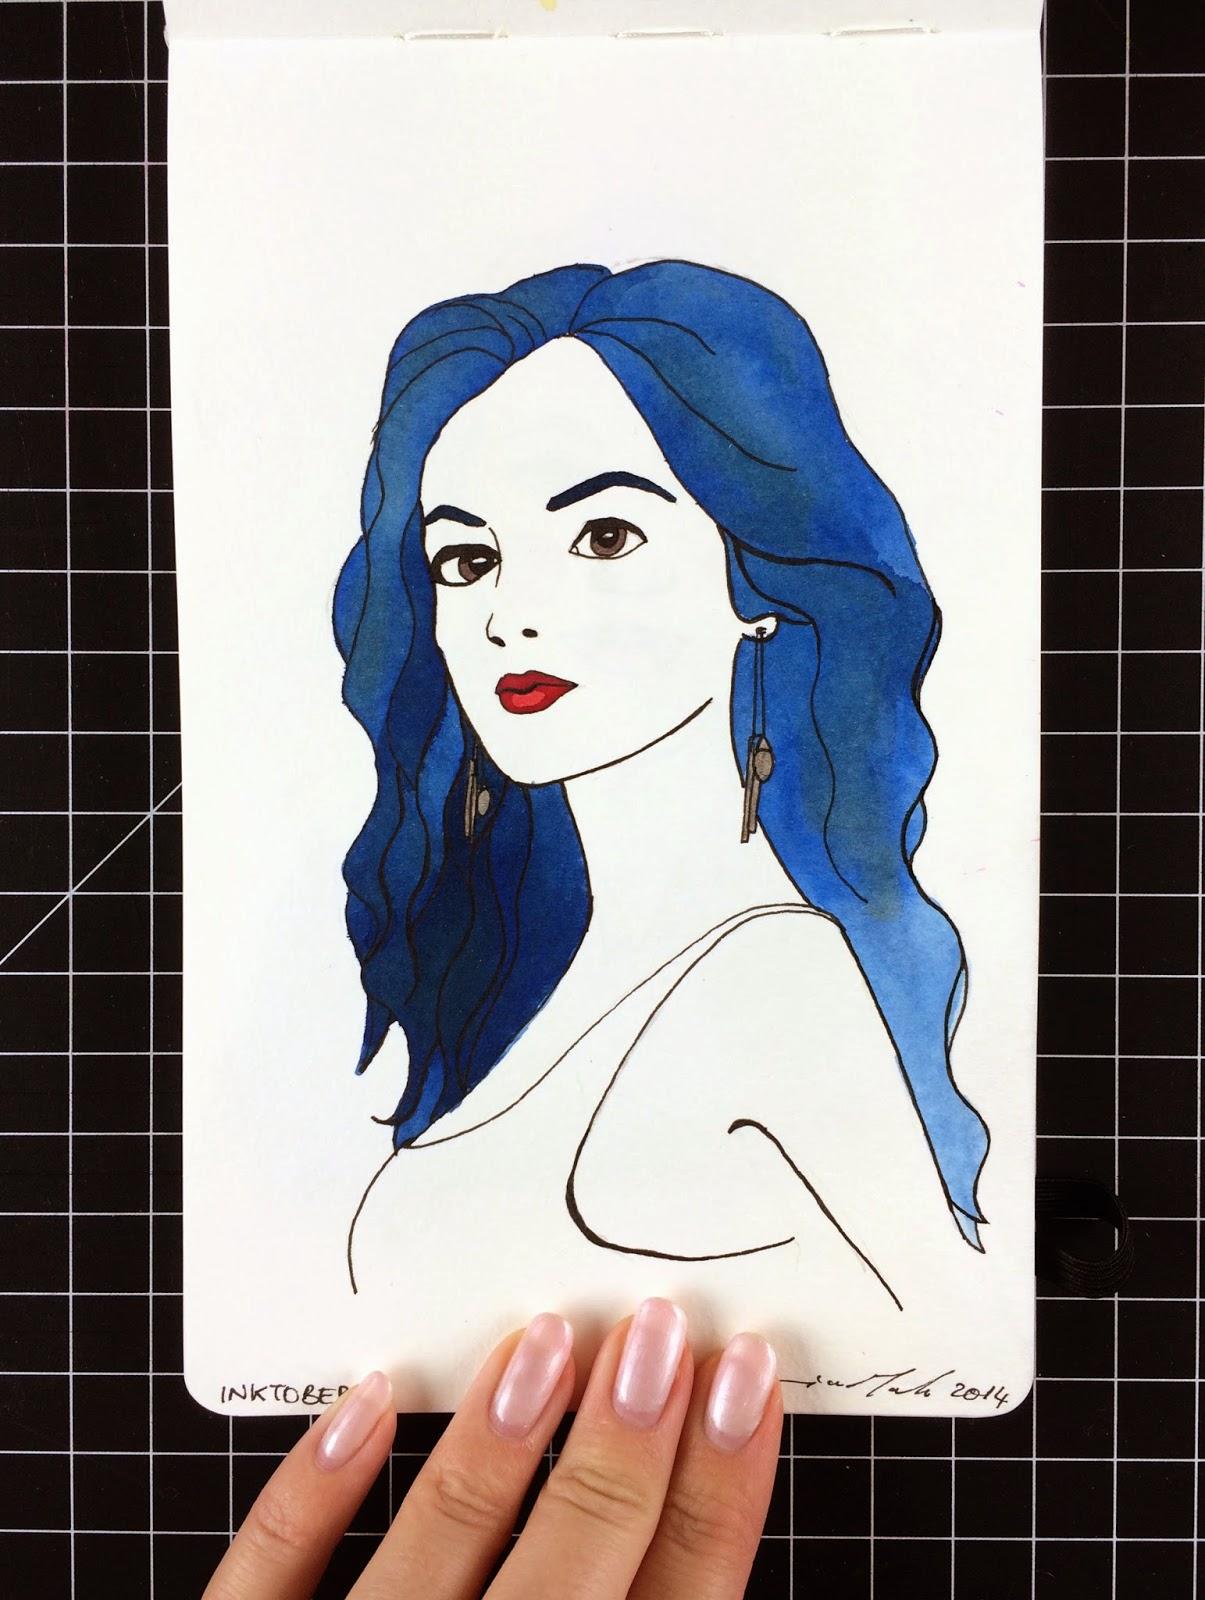 Inktober fashion illustration of Lucy Hale by Jessica Mack aka BrownPaperBunny